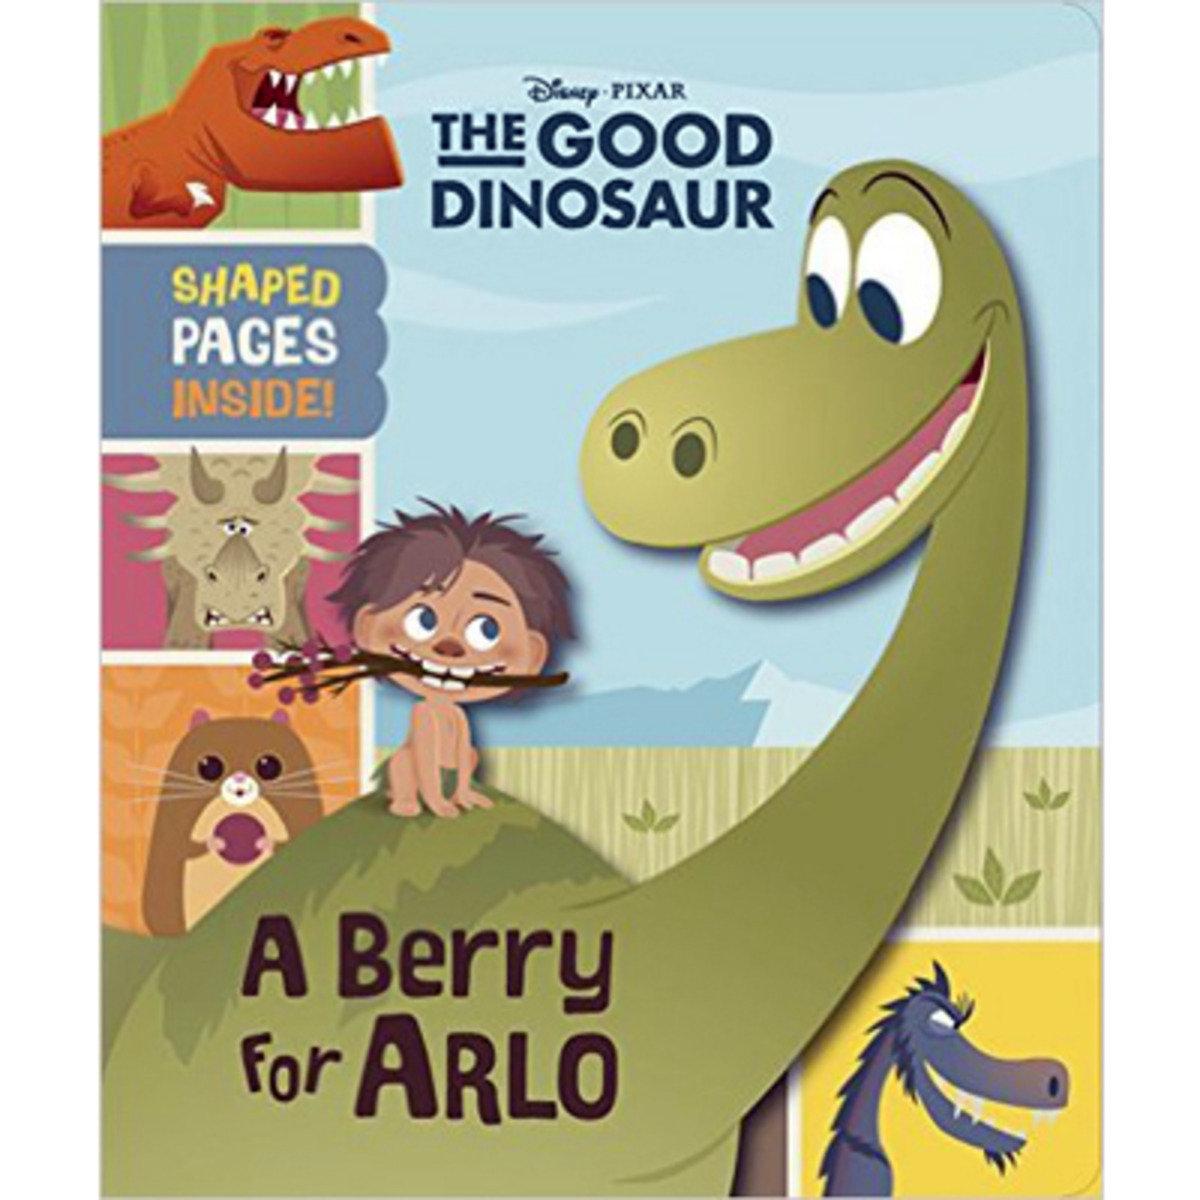 THE GOOD DINOSAUR: A BERRY FOR ARLO 9781484700990